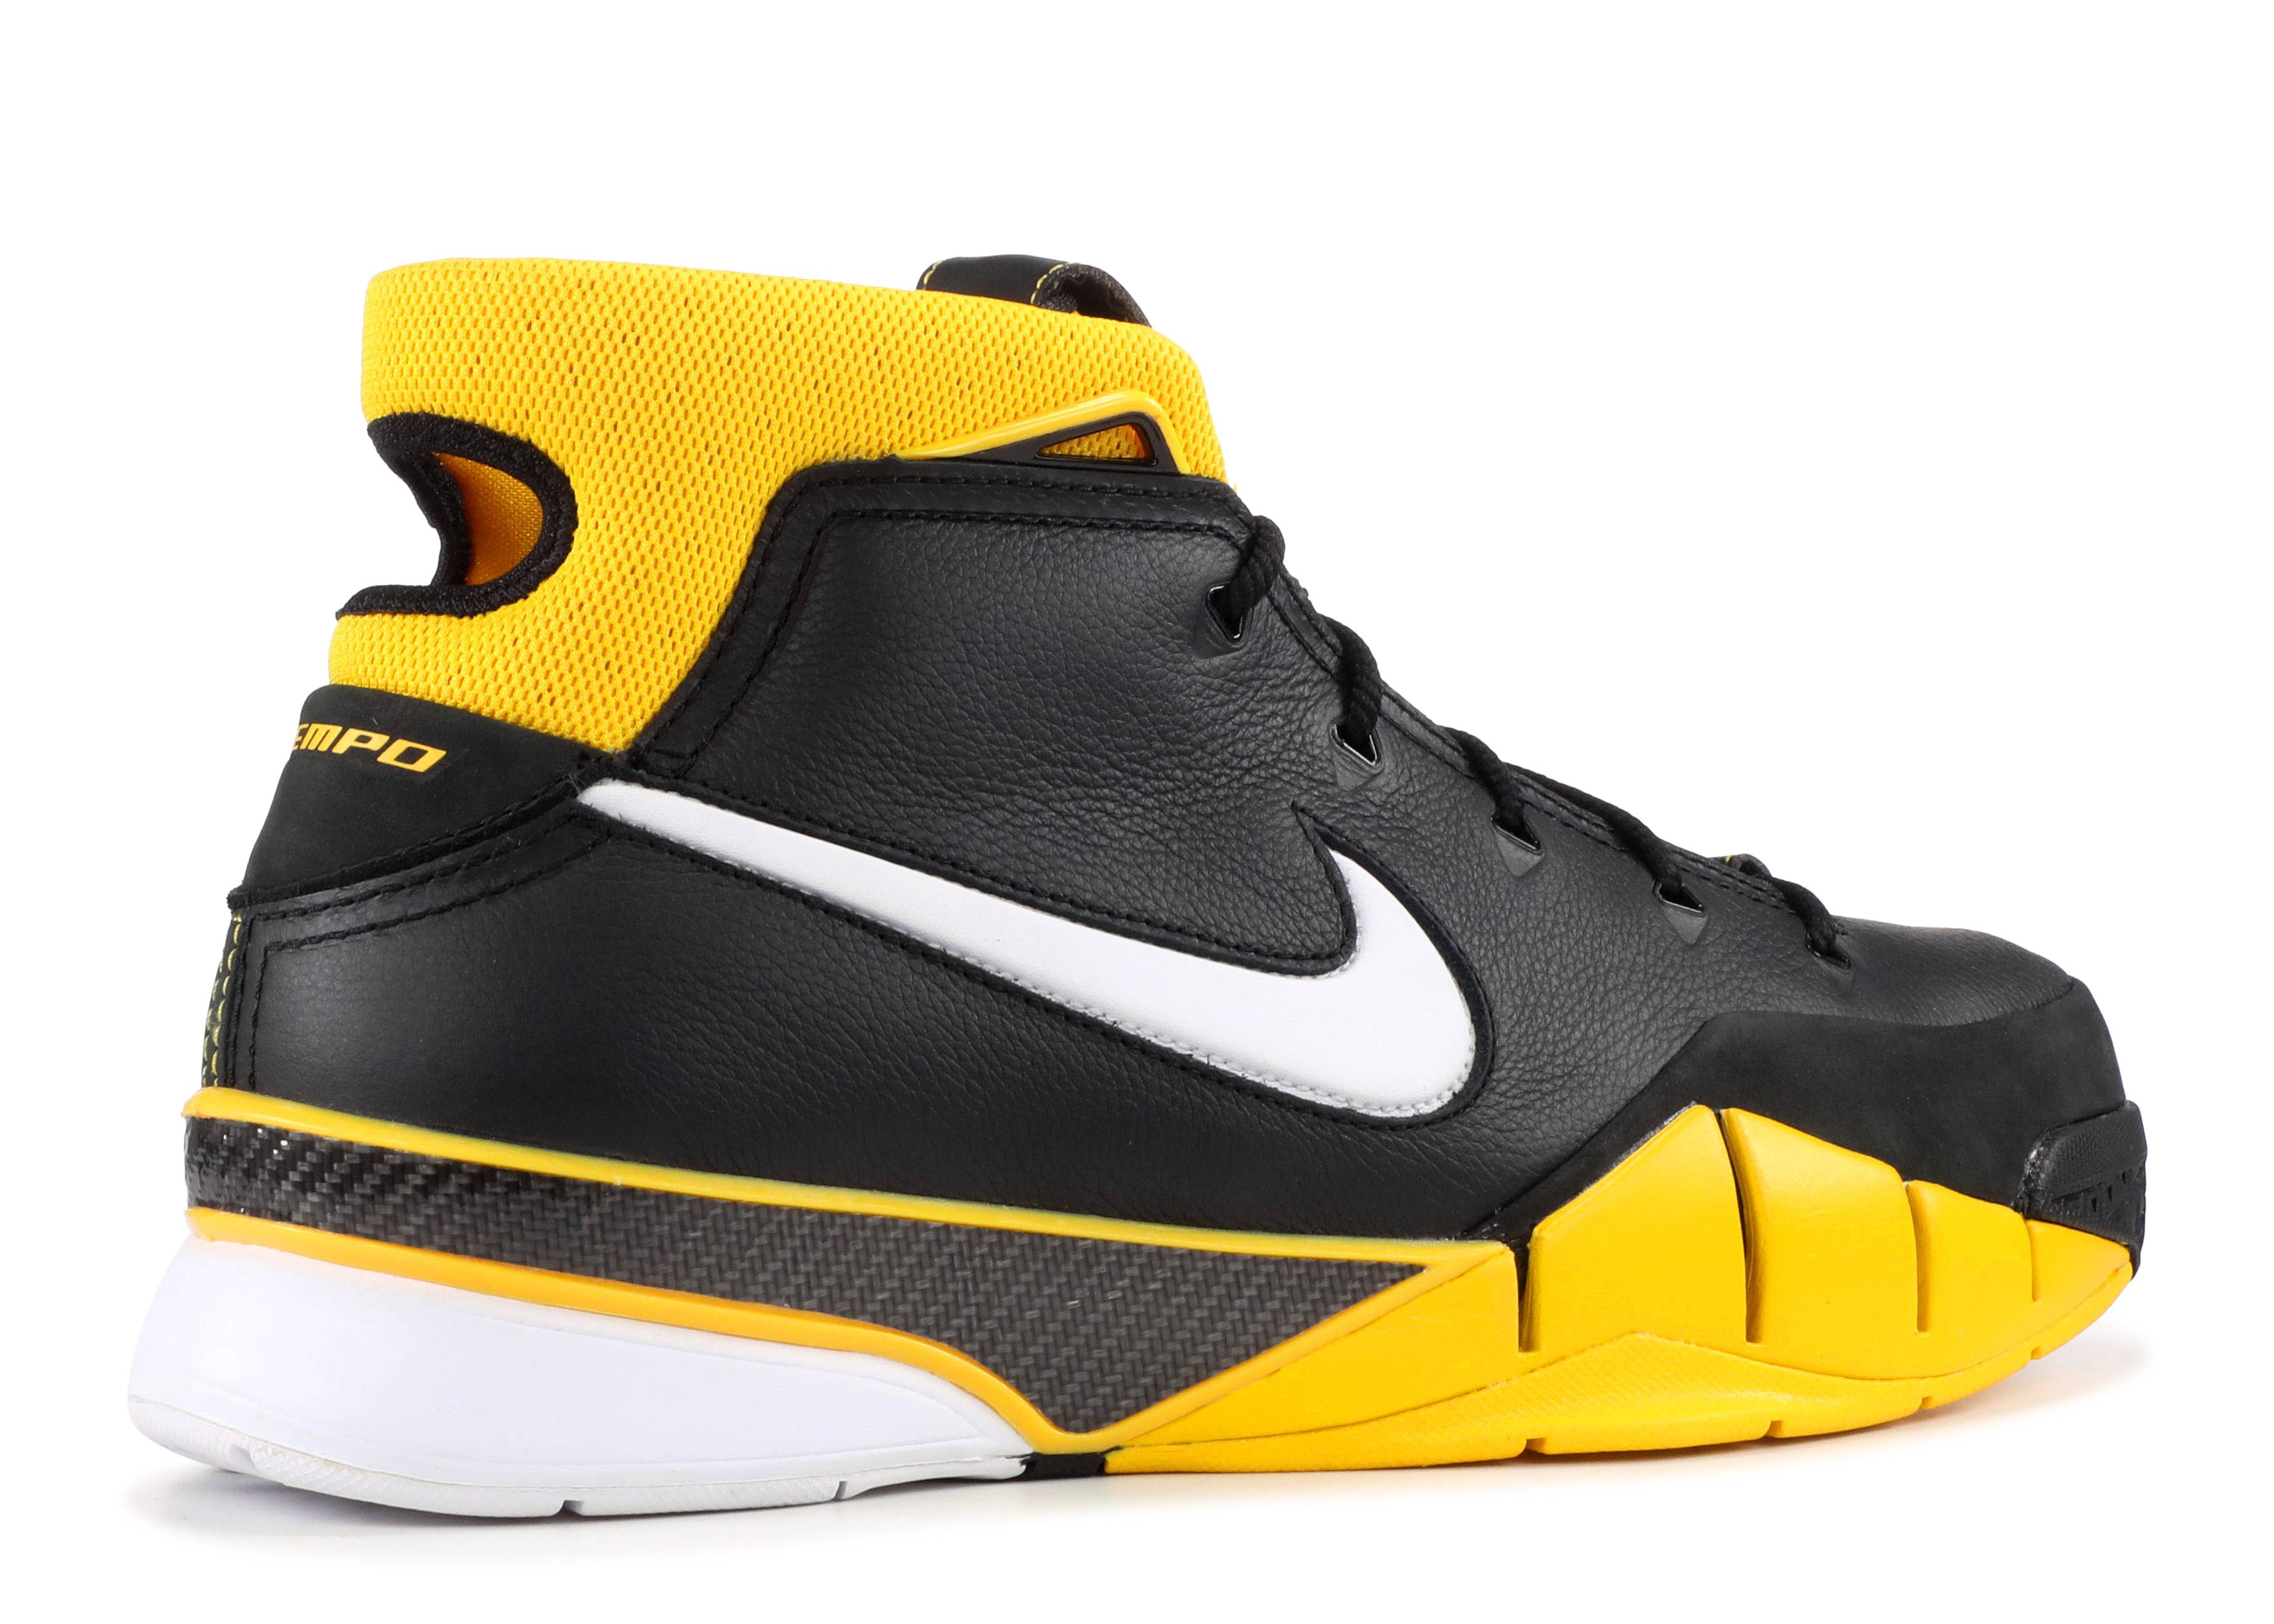 a562a33b8dc Kobe 1 Protro - Nike - AQ2728 003 - black.white-varsity maize ...